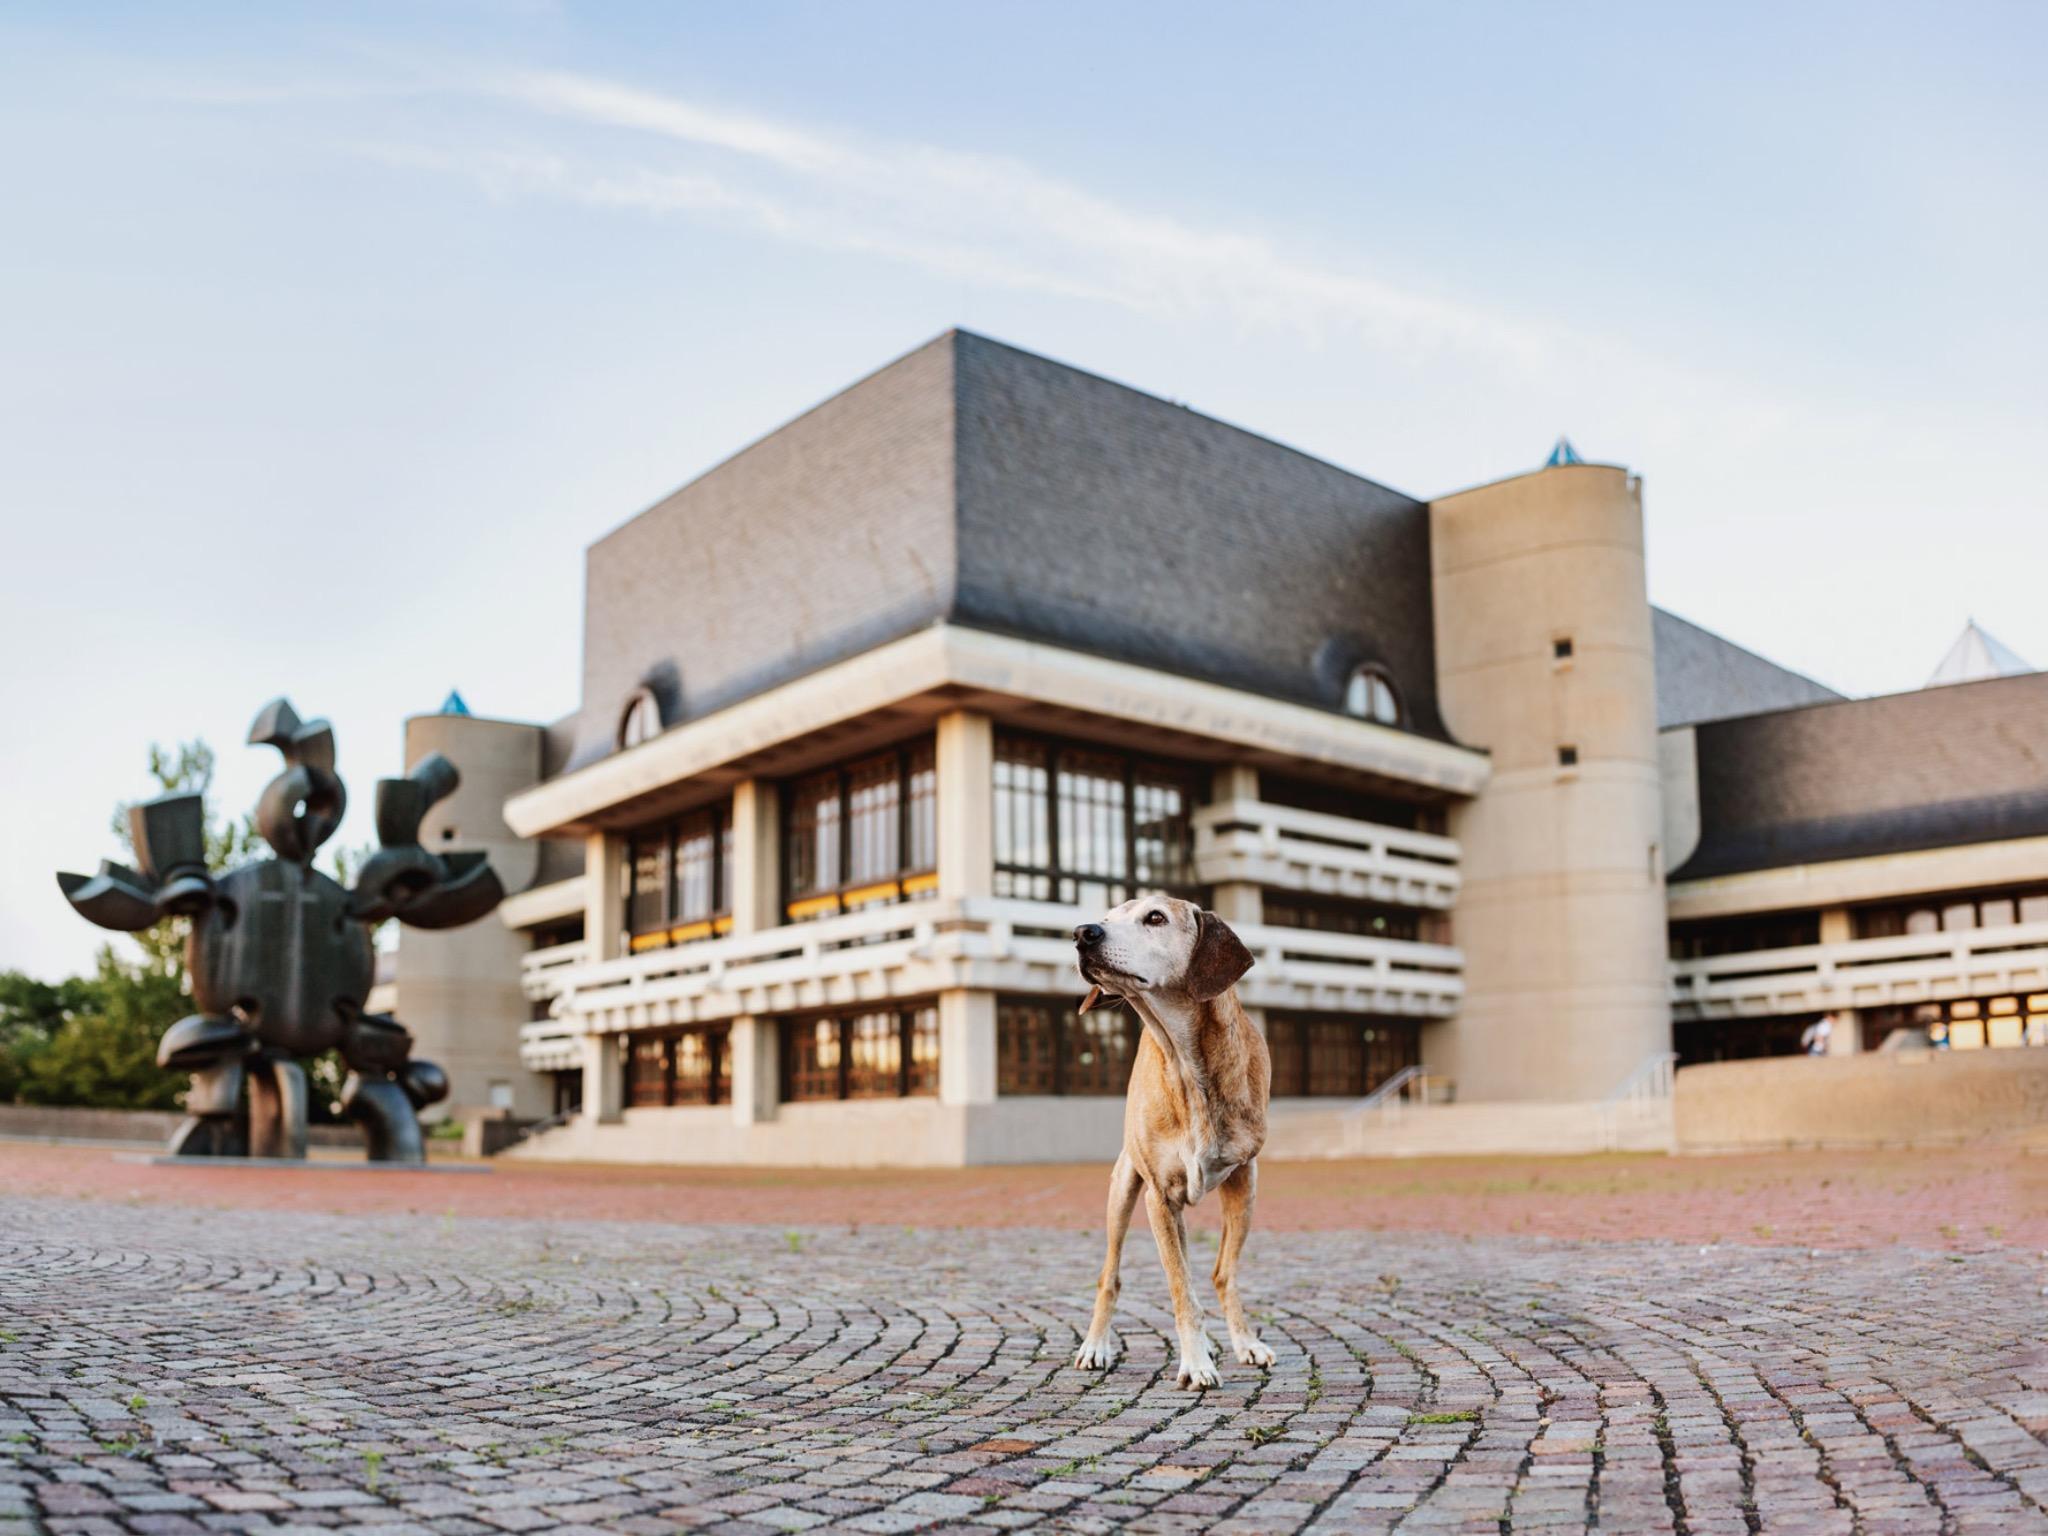 Der Hundeherr Mato vor der Uni-Bibliothek am Hubland. Foto: Yasemin Ikibas